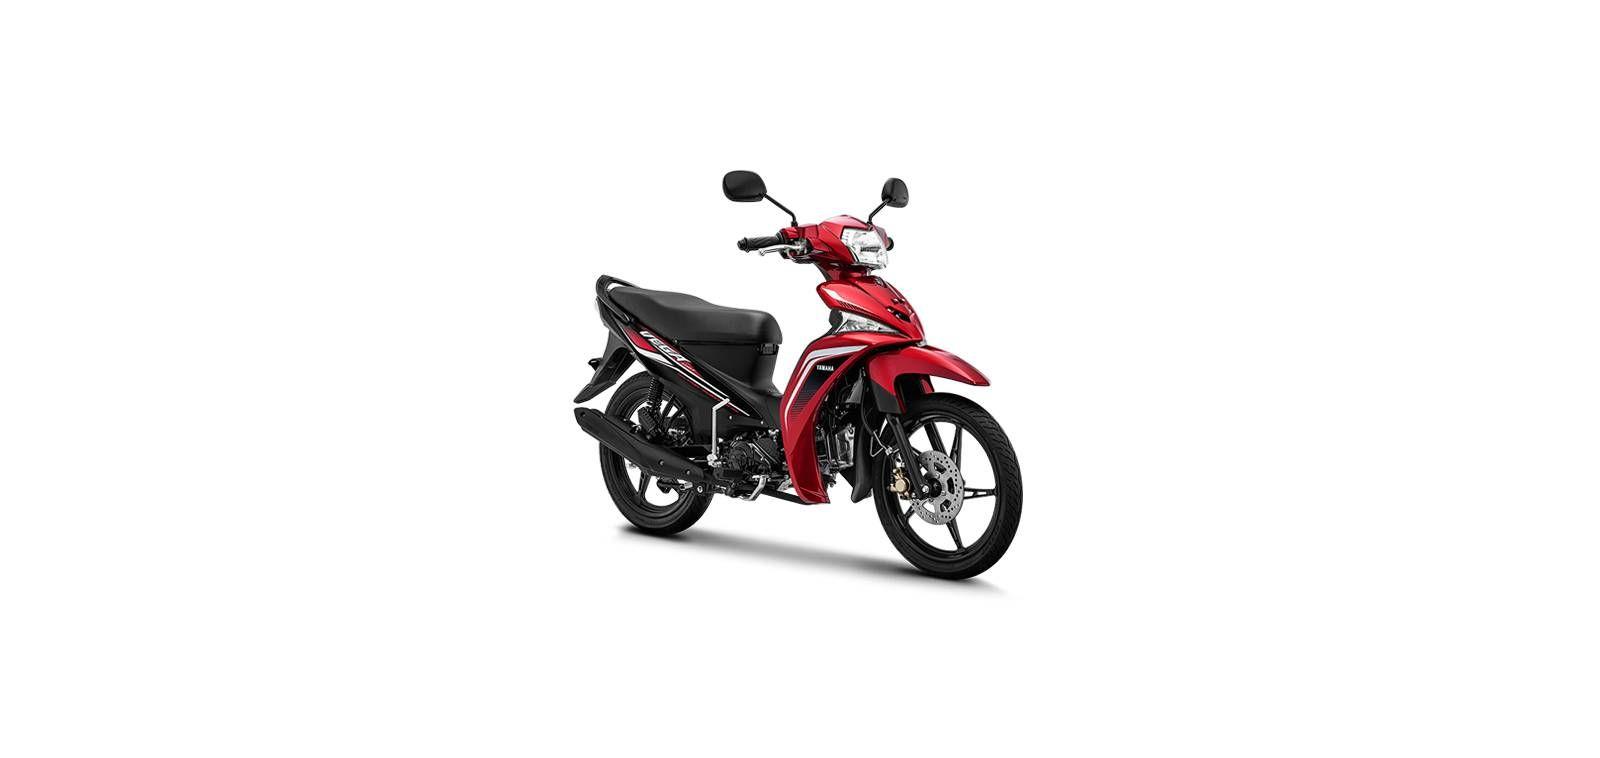 Yamaha Vega Force 2019 - Metallic Red